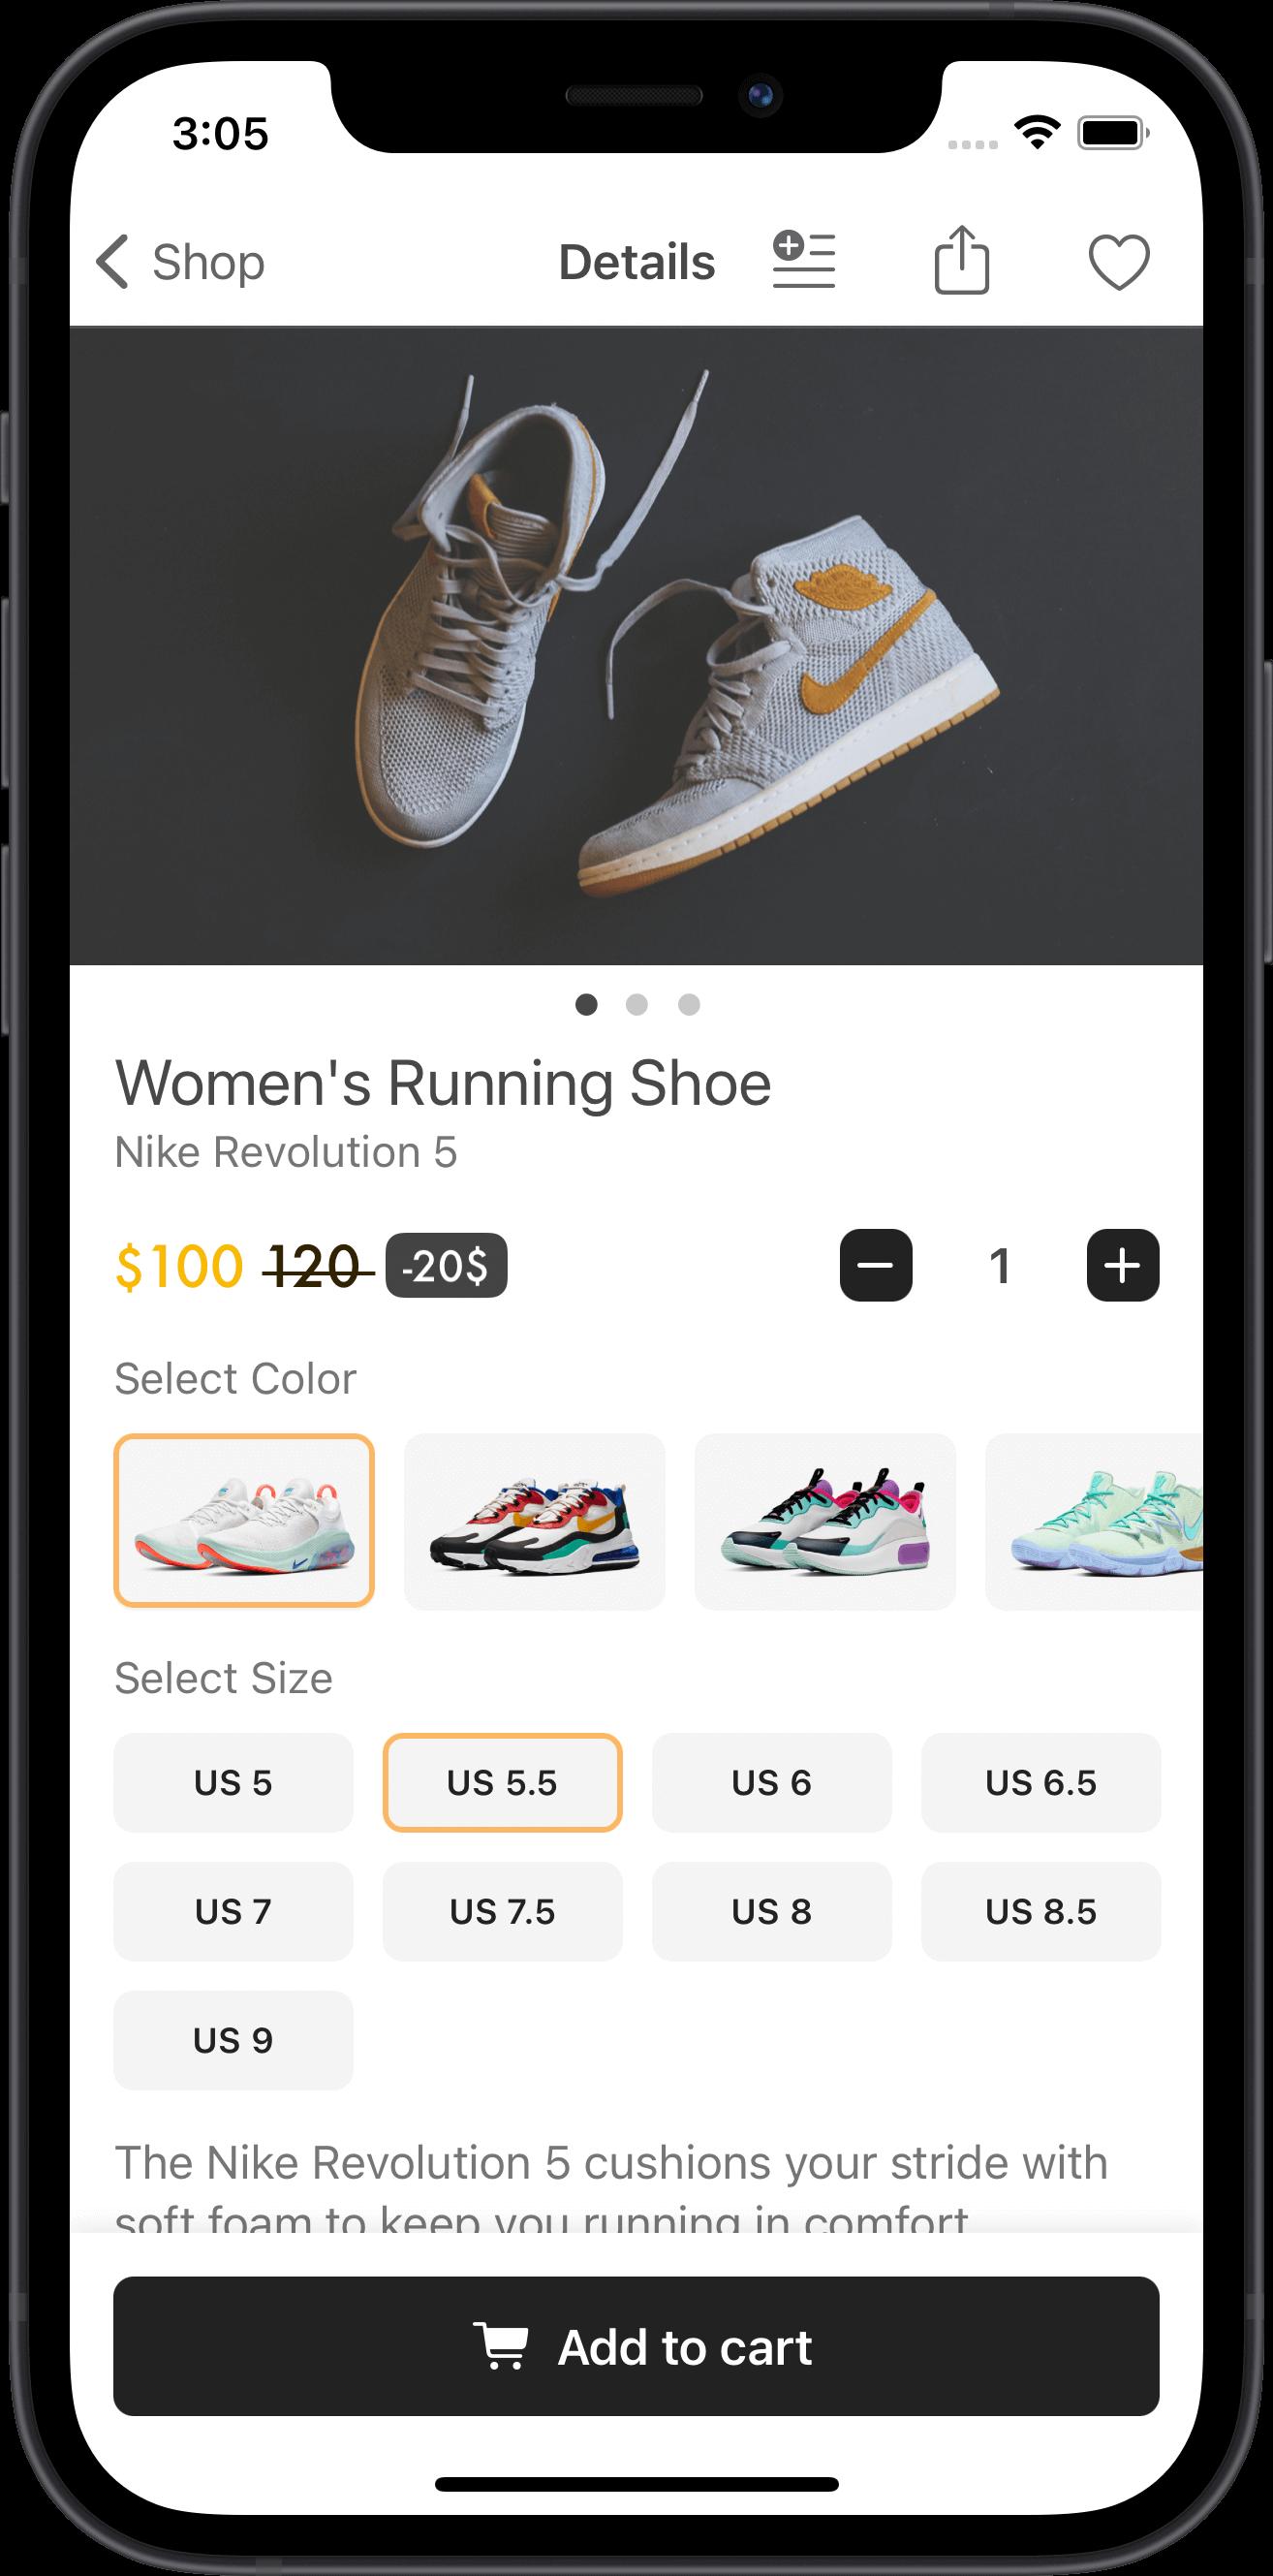 e-commerce, women, running shoes